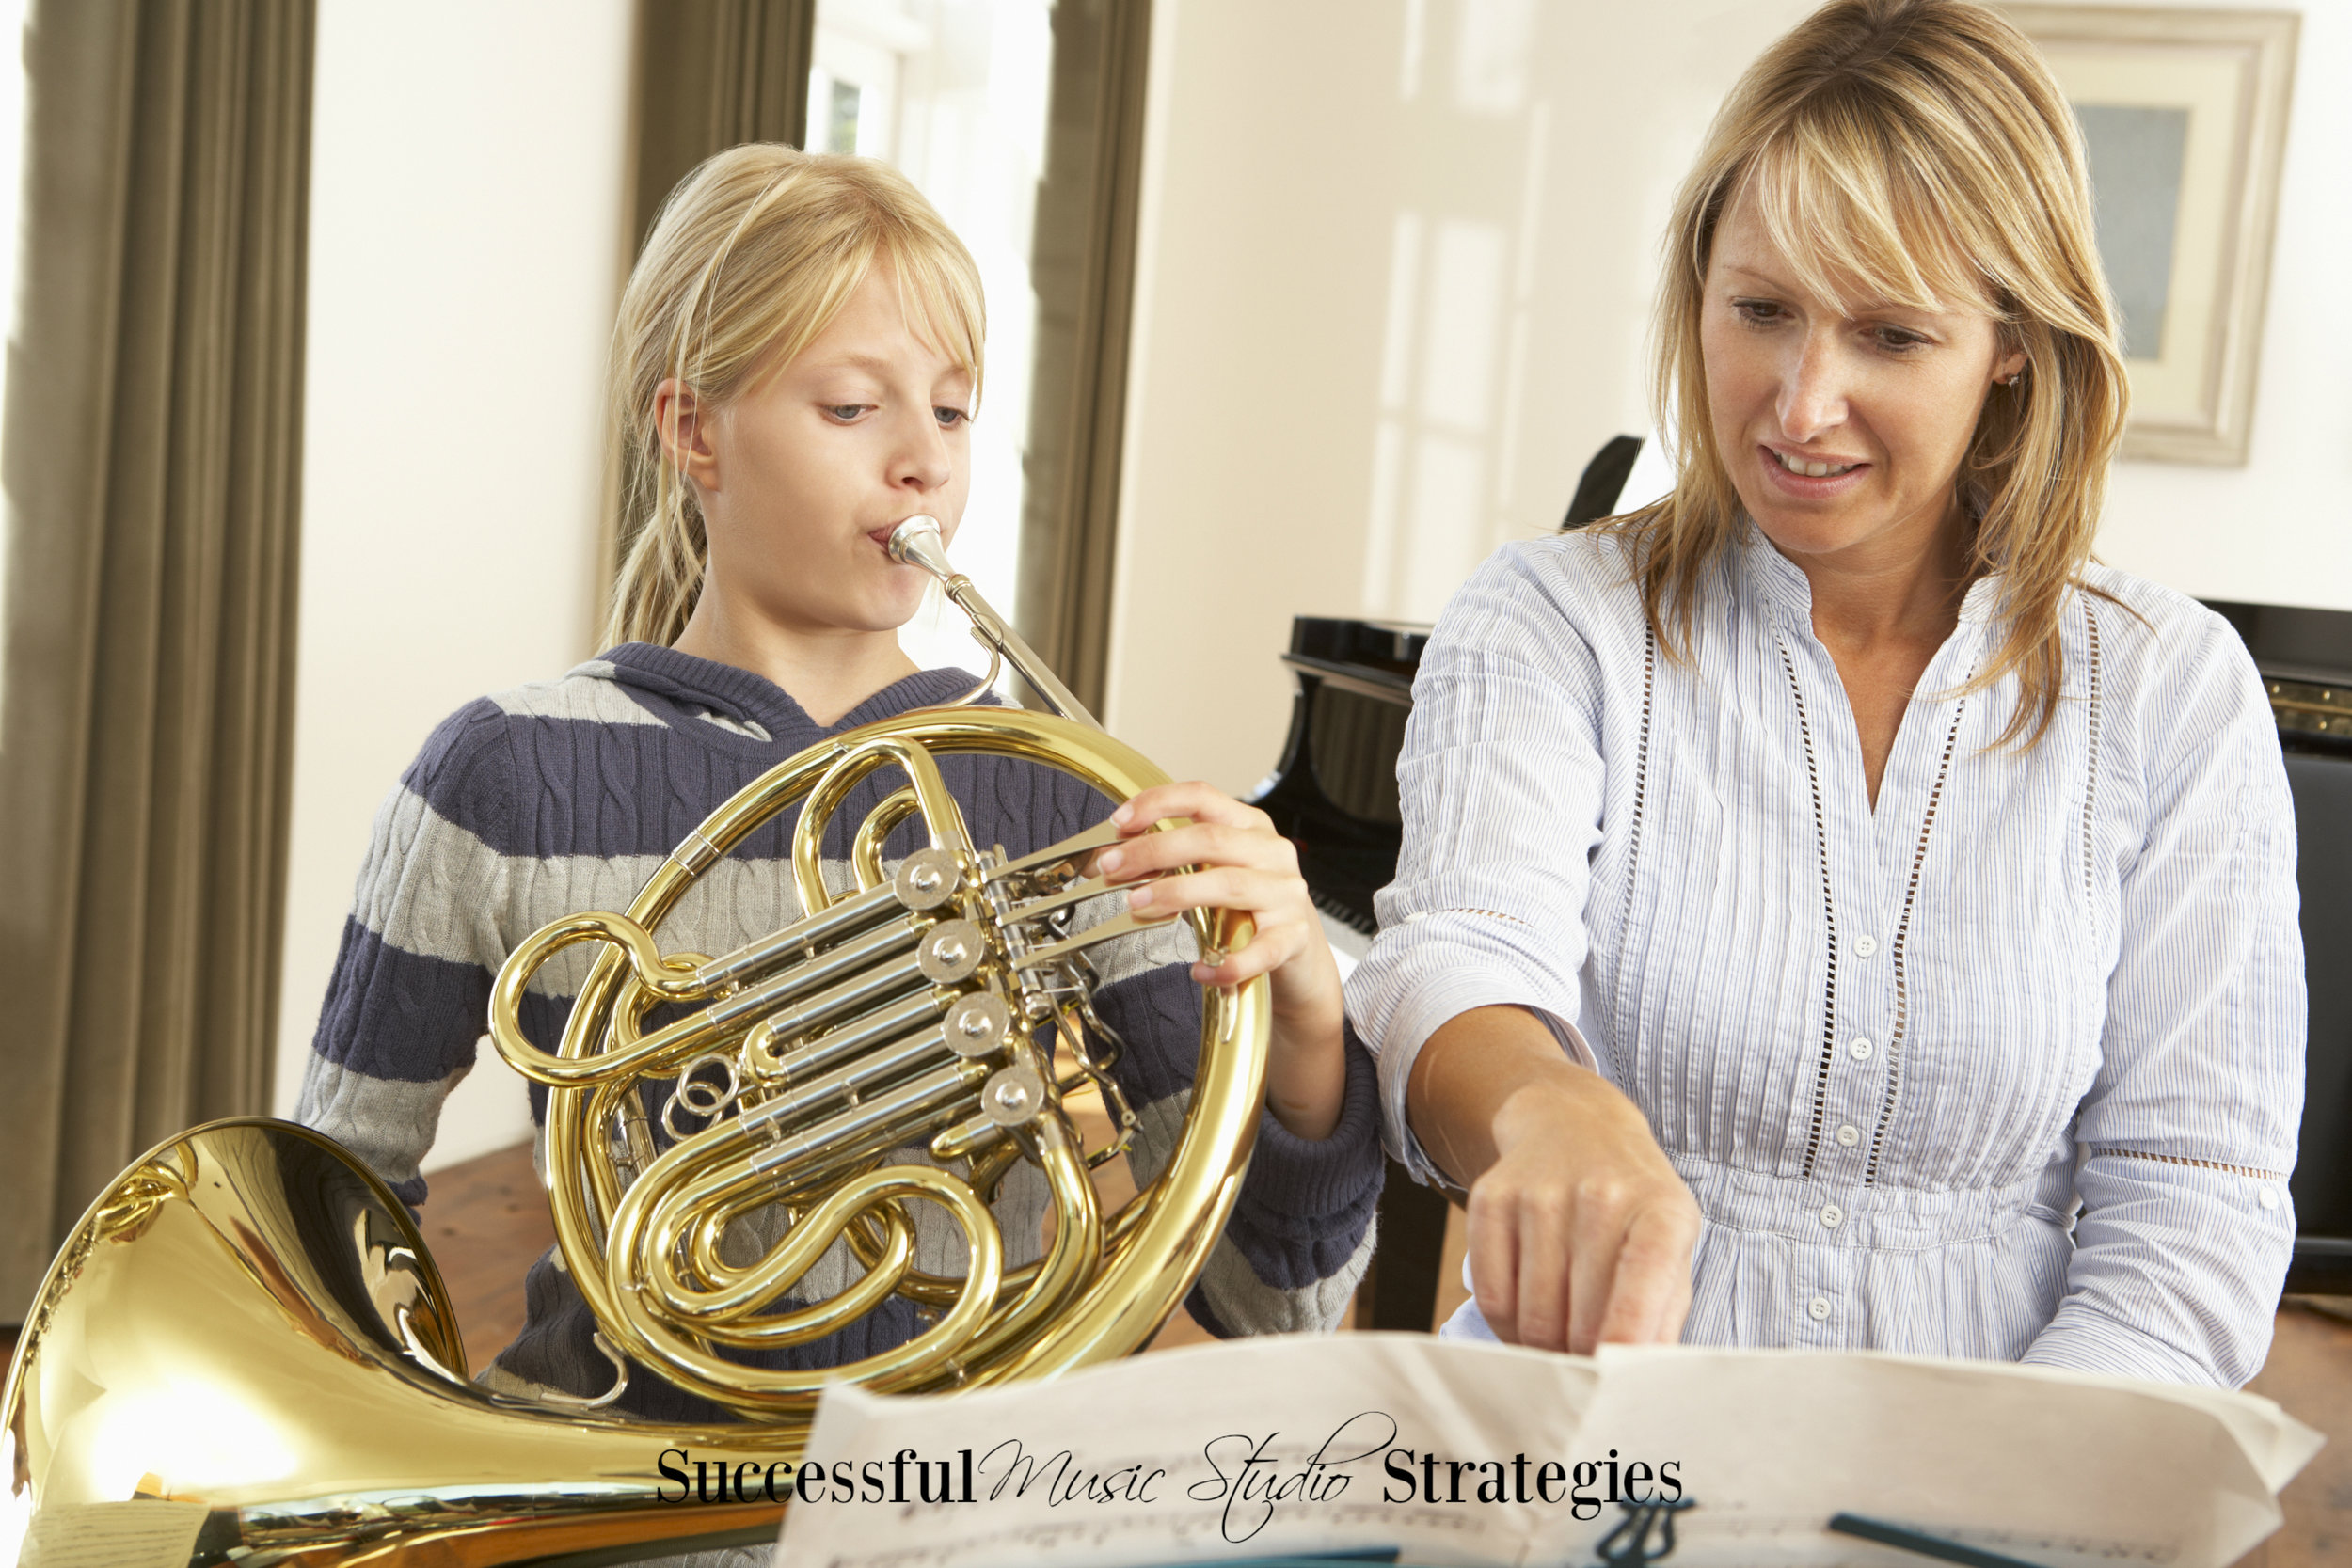 successful music studio strategies horn.jpg